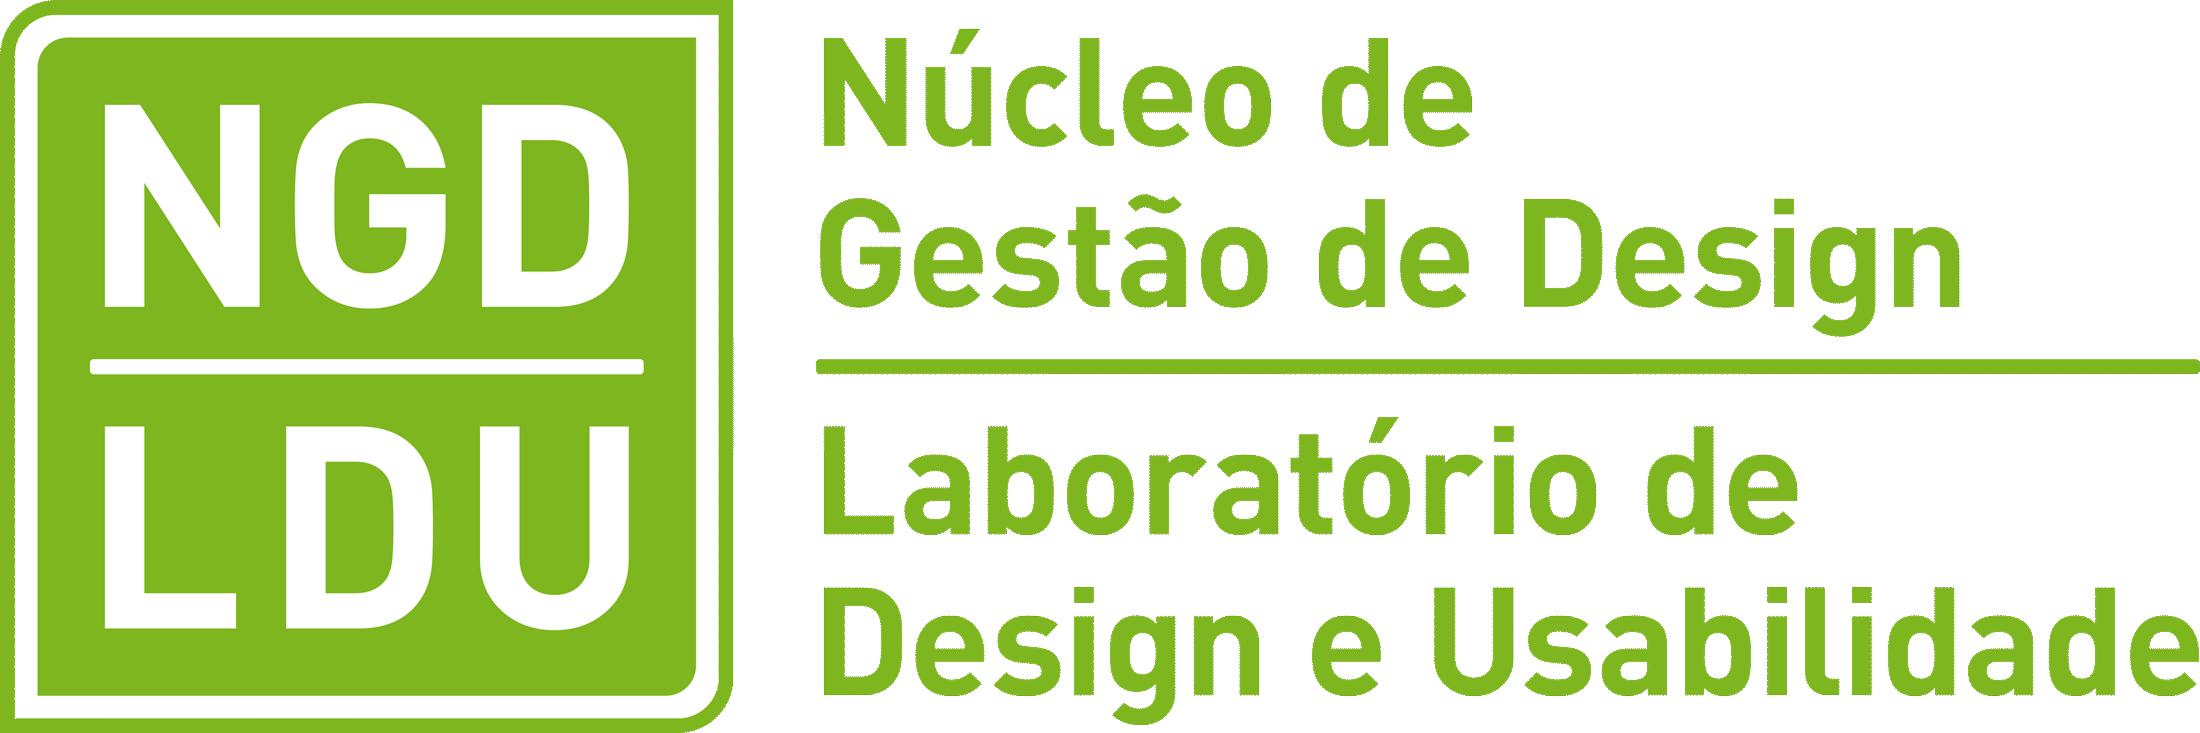 NGD-LDU